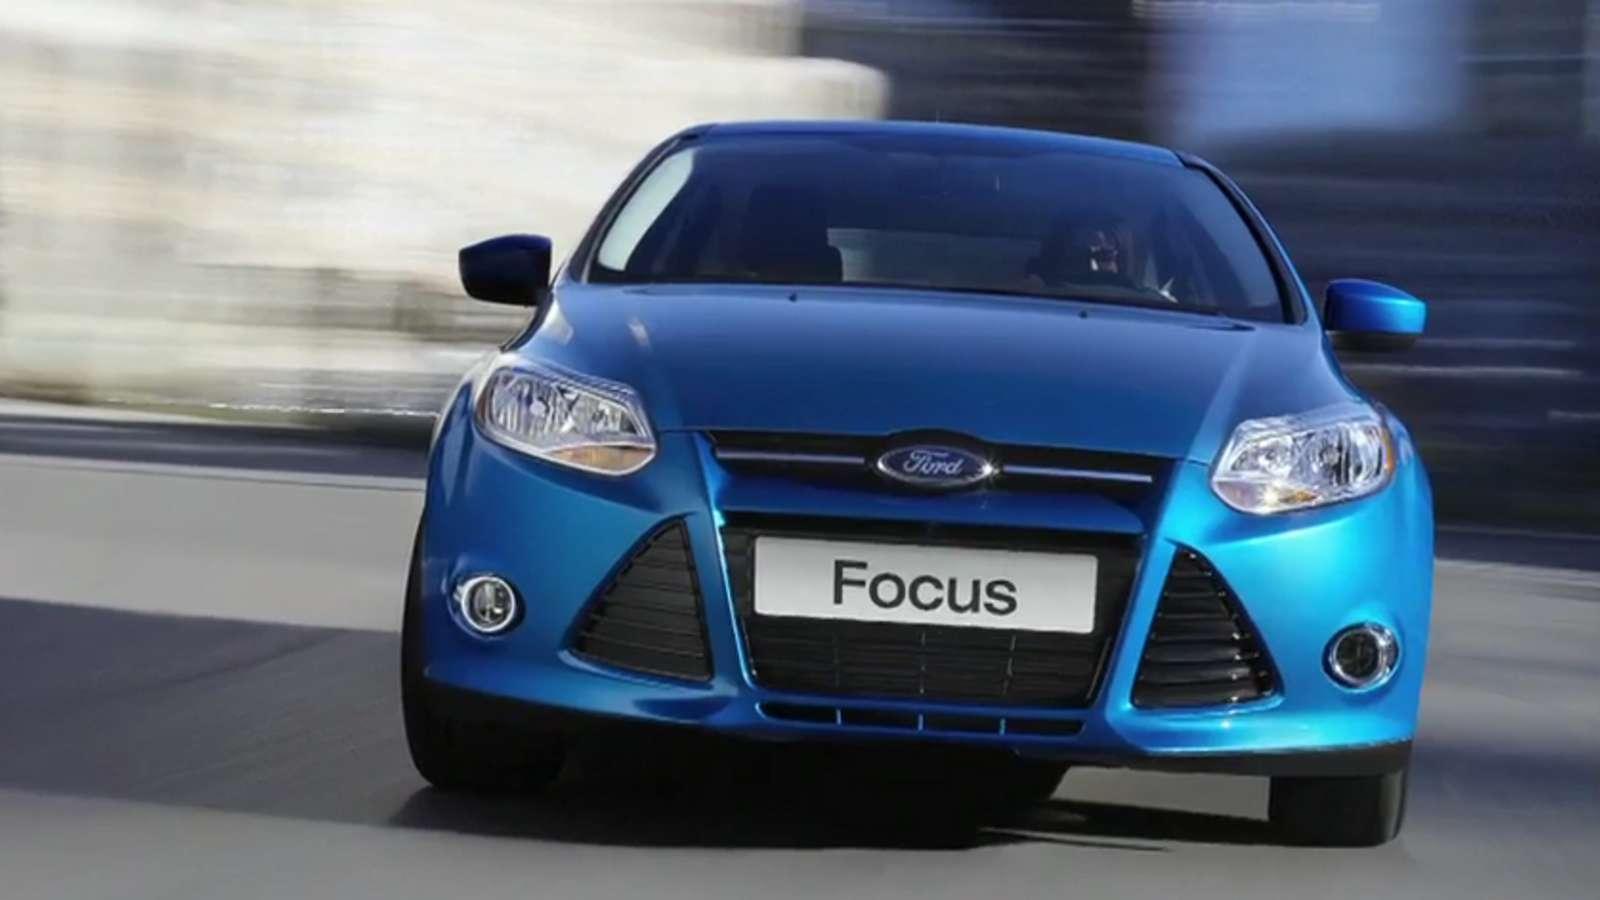 Ford knew Focus, Fiesta had flawed transmission, sold them